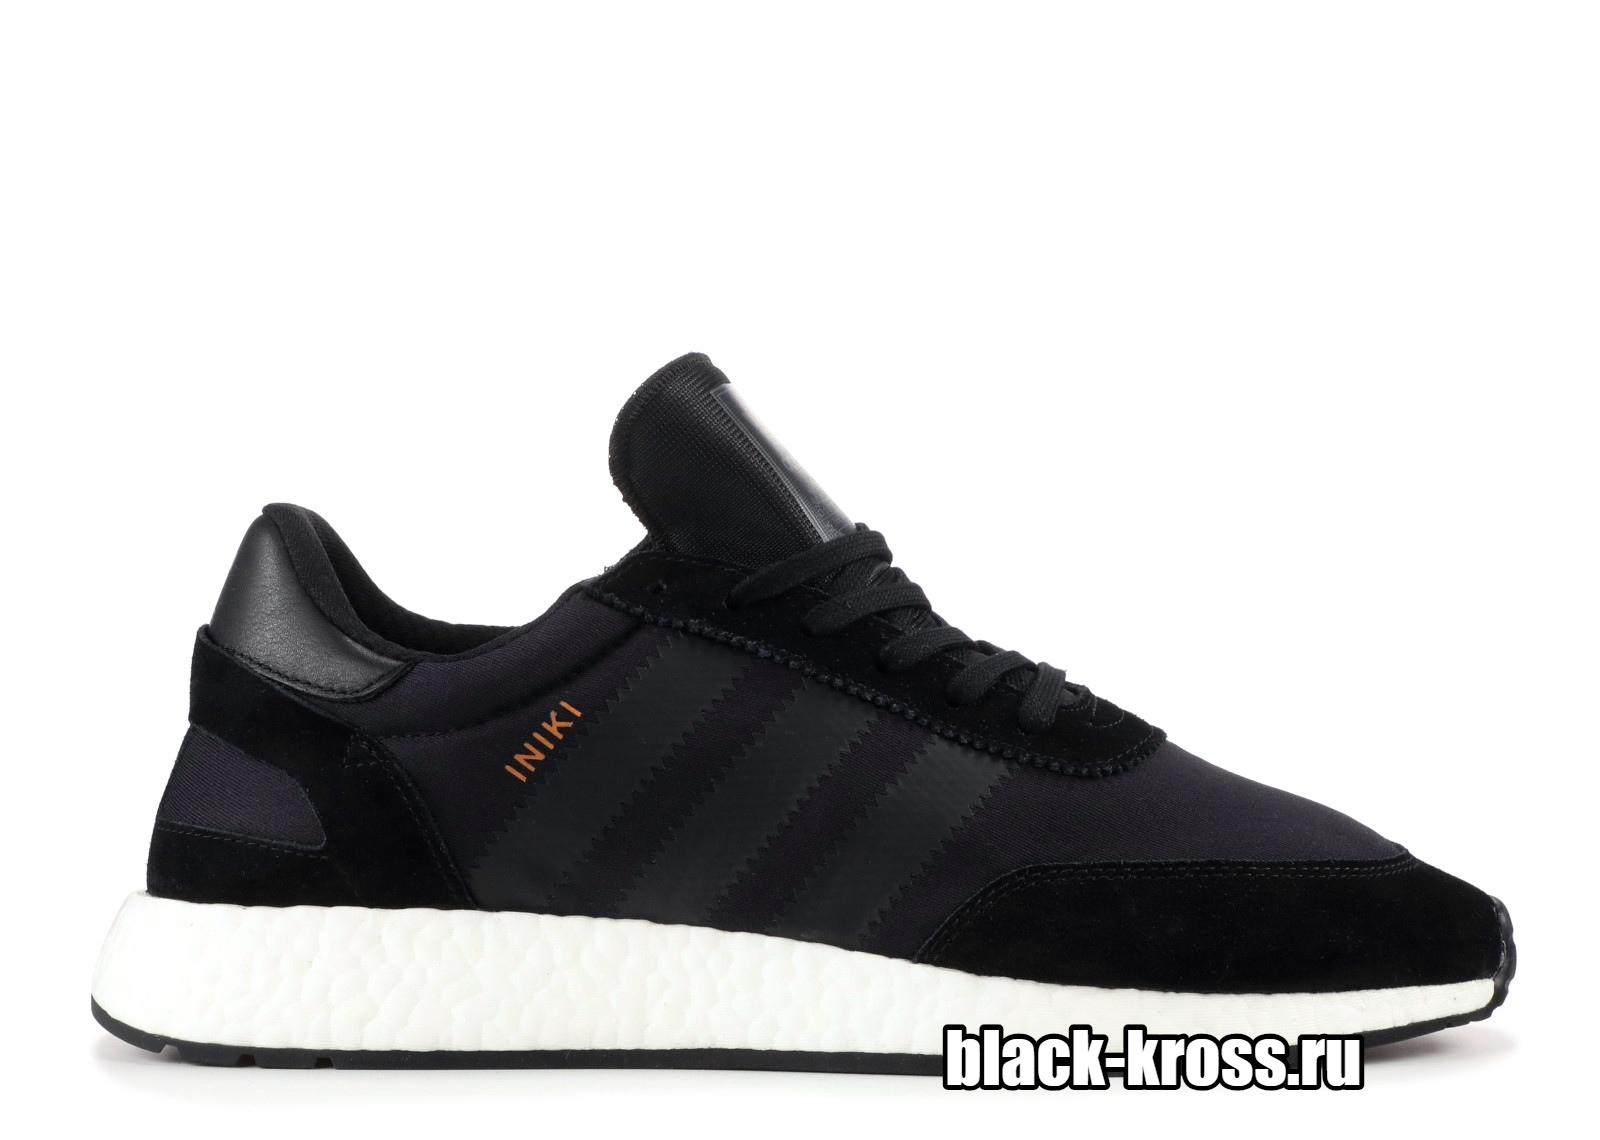 Adidas Iniki Runner Core Black/White  (41-45)